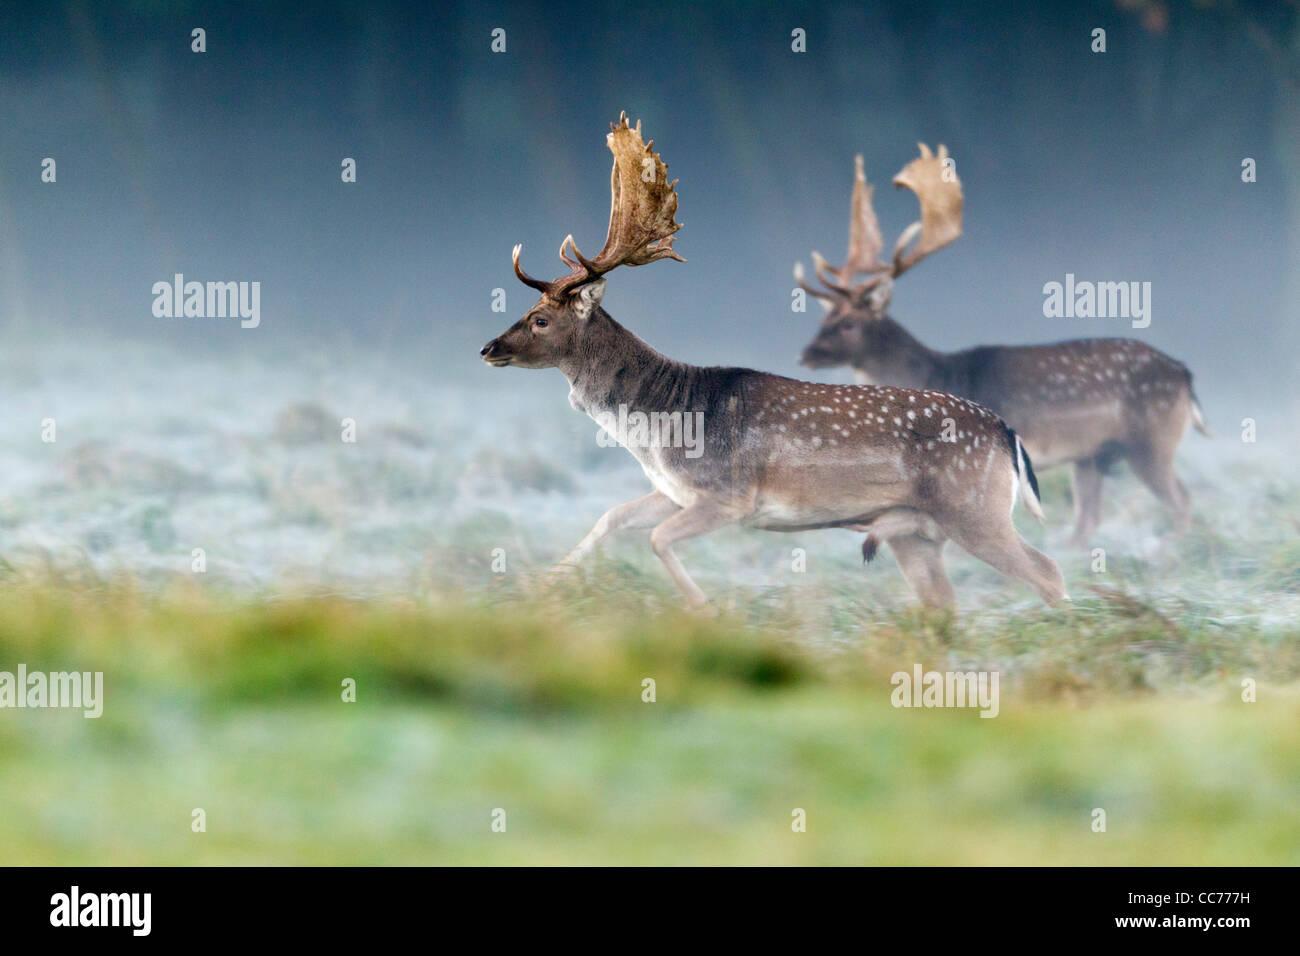 Fallow Deer (Dama dama), Buck Running, during the Rut, Royal Deer Park, Klampenborg, Copenhagen, Sjaelland, Denmark Stock Photo